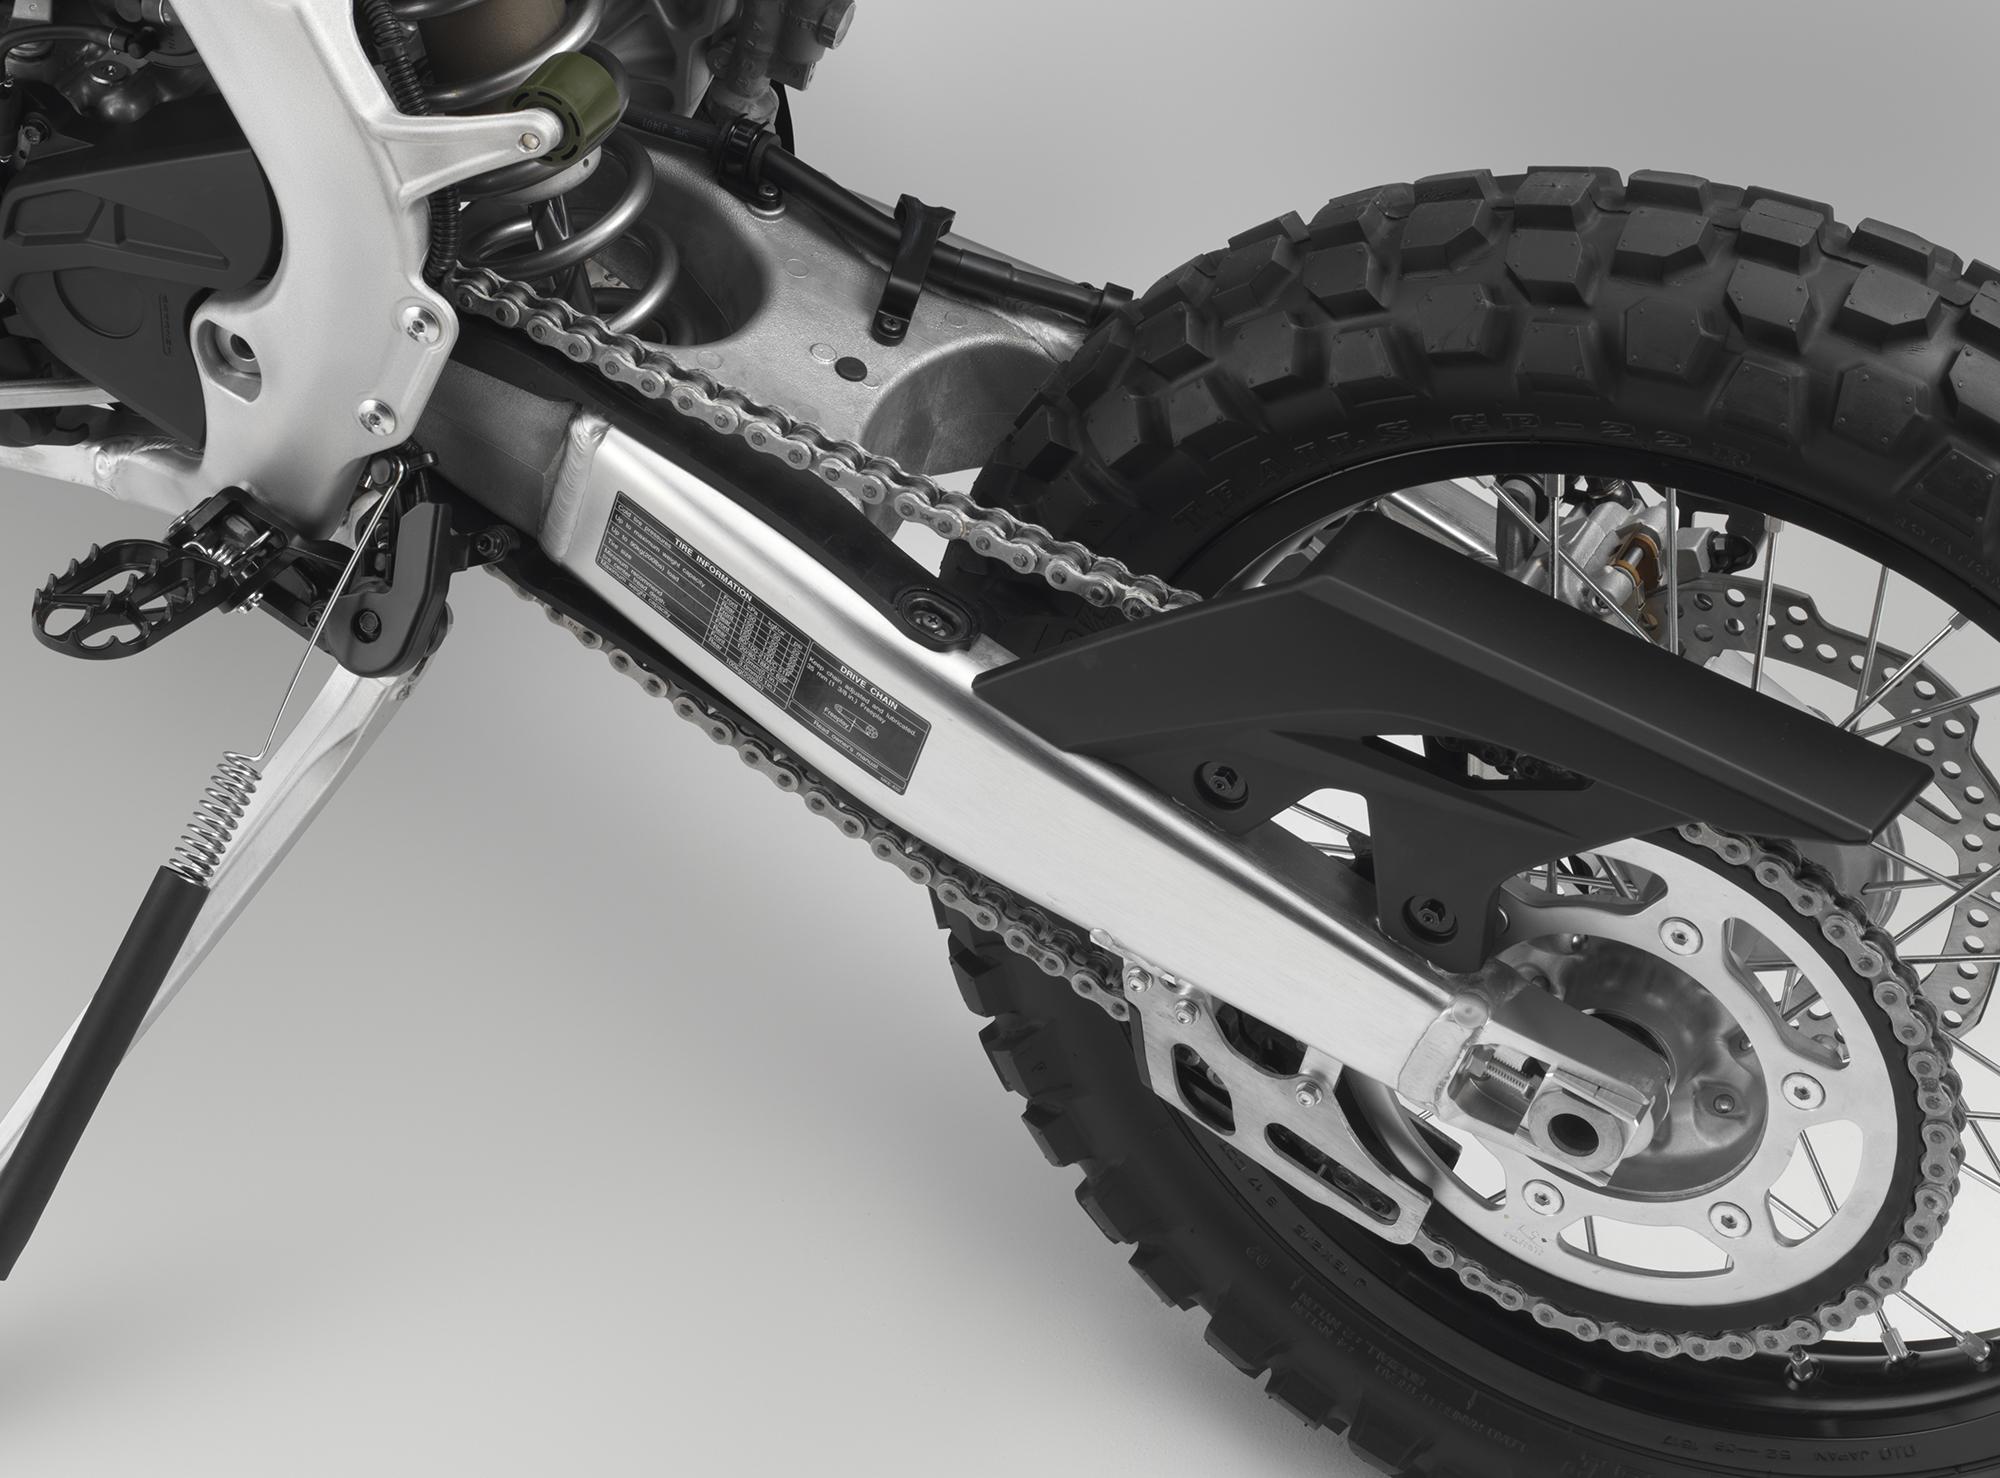 19 Honda CRF450L_swingarm.jpg